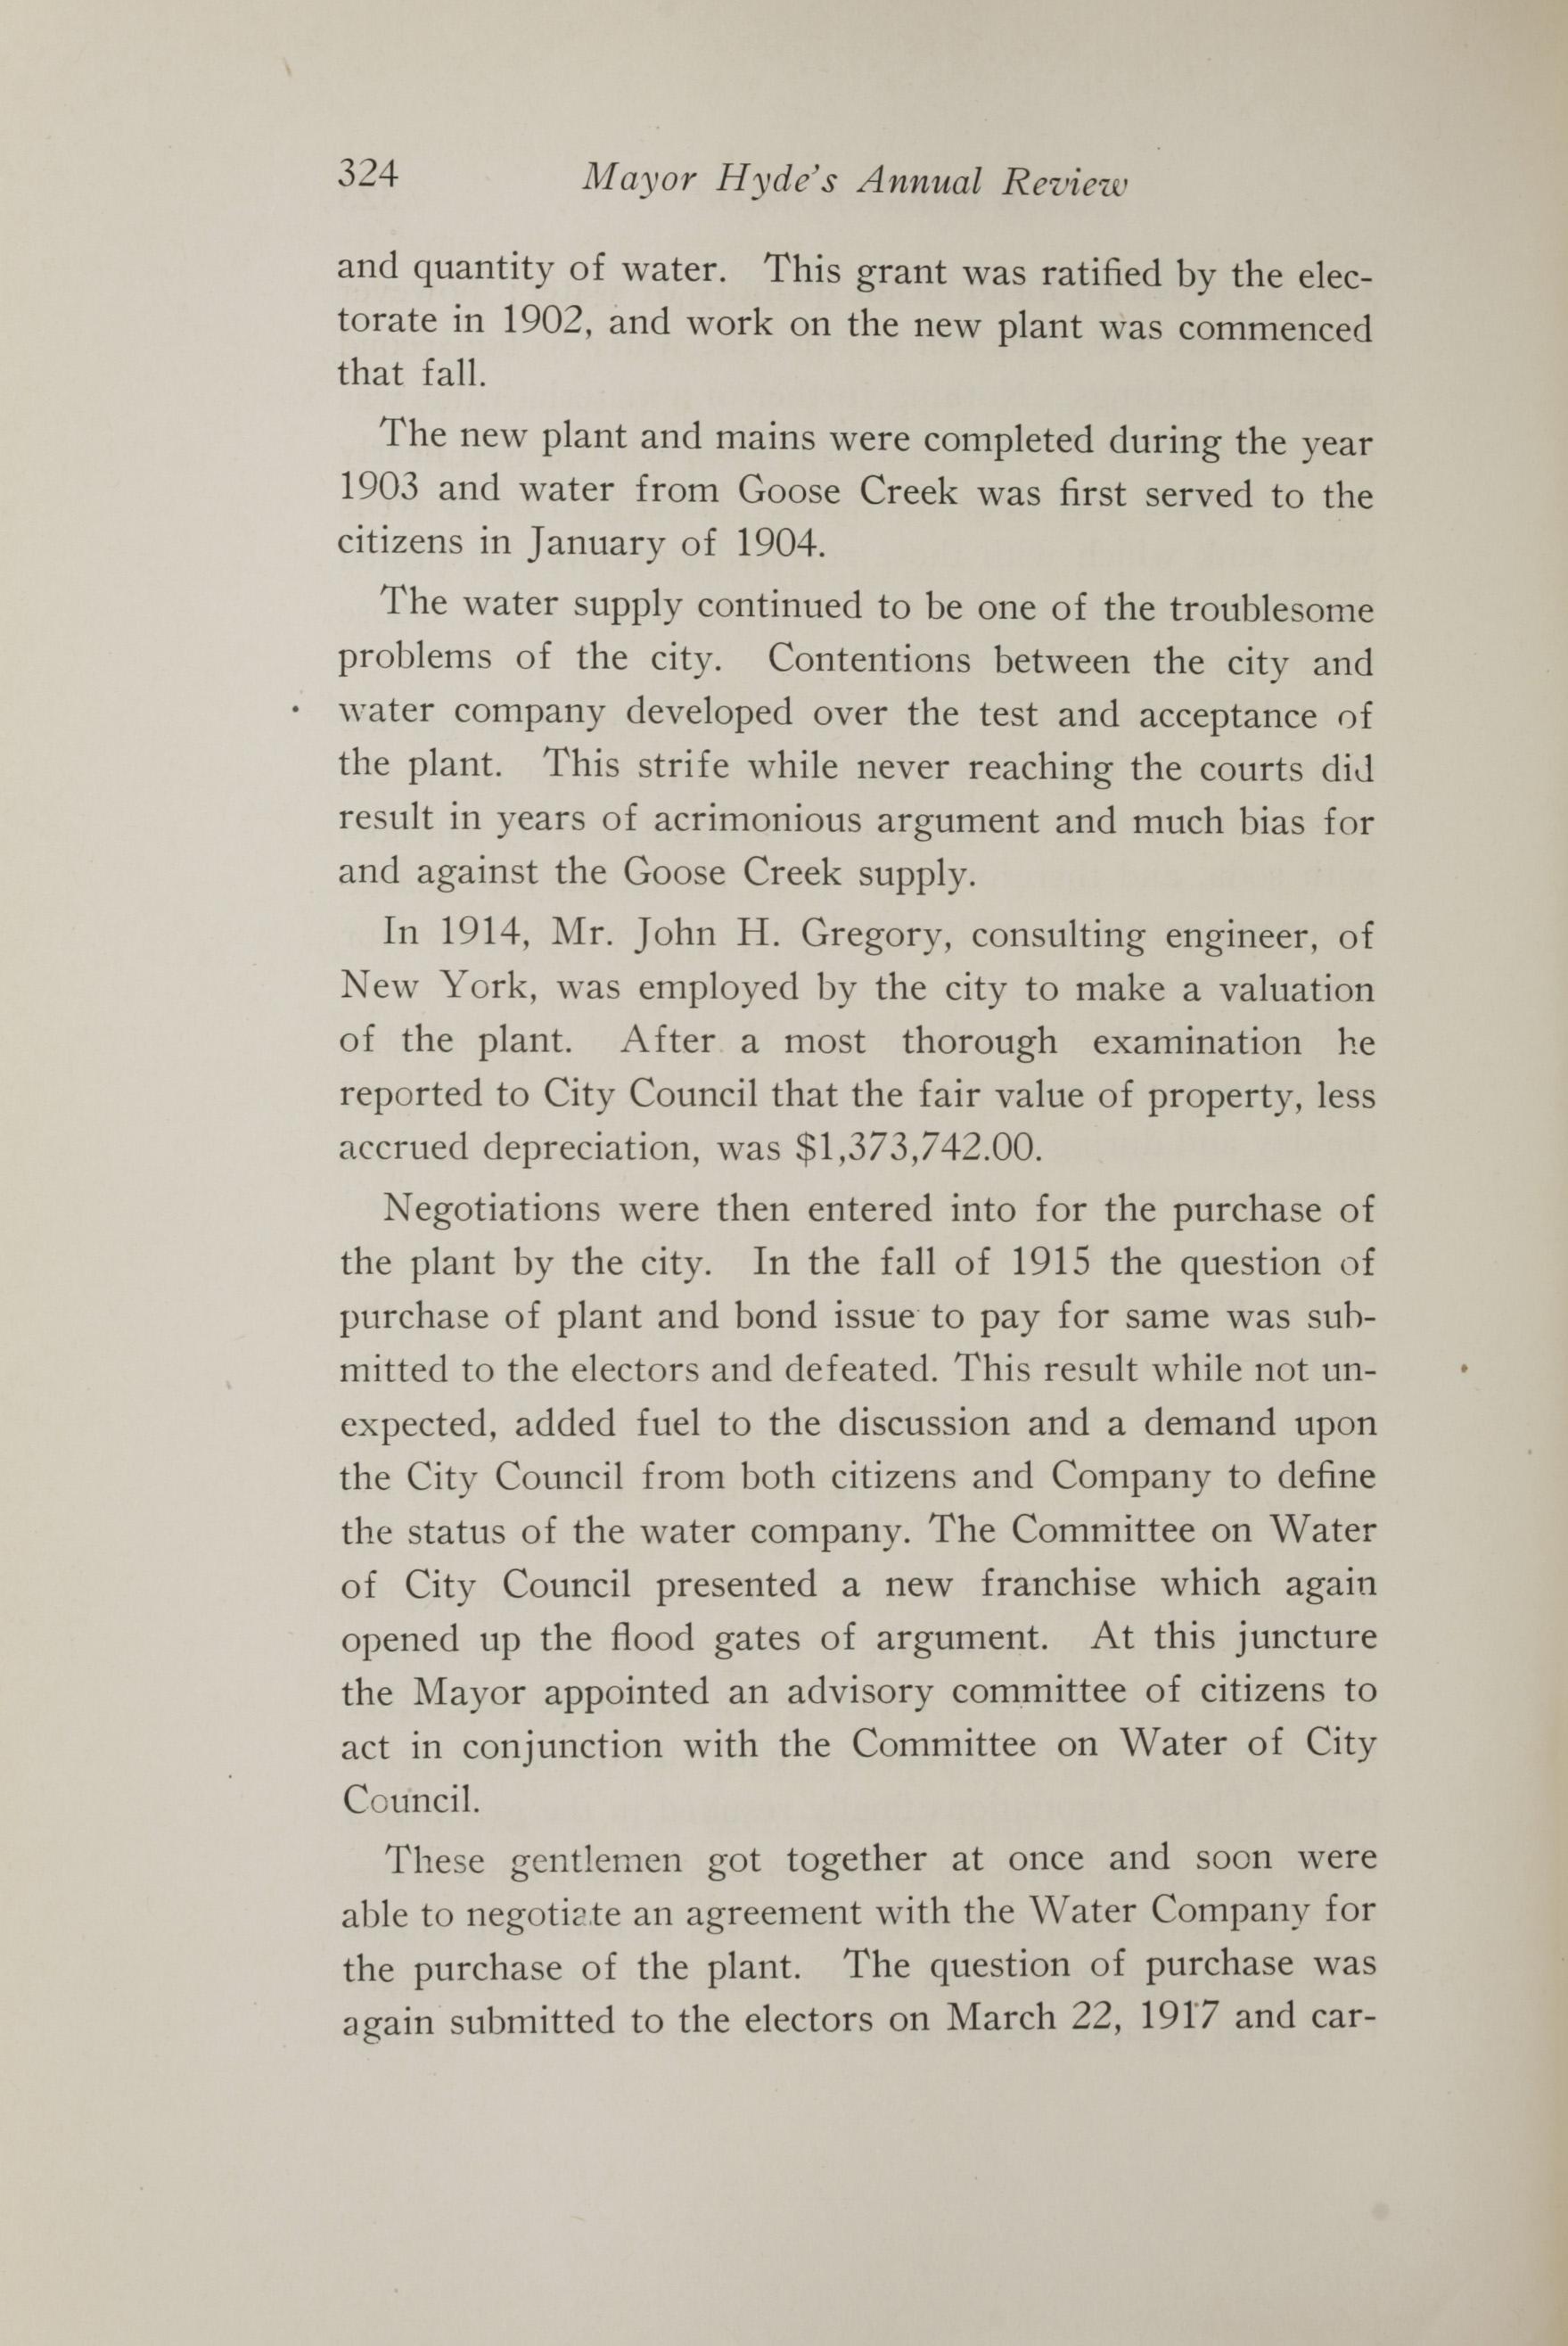 Charleston Yearbook, 1917, page 324